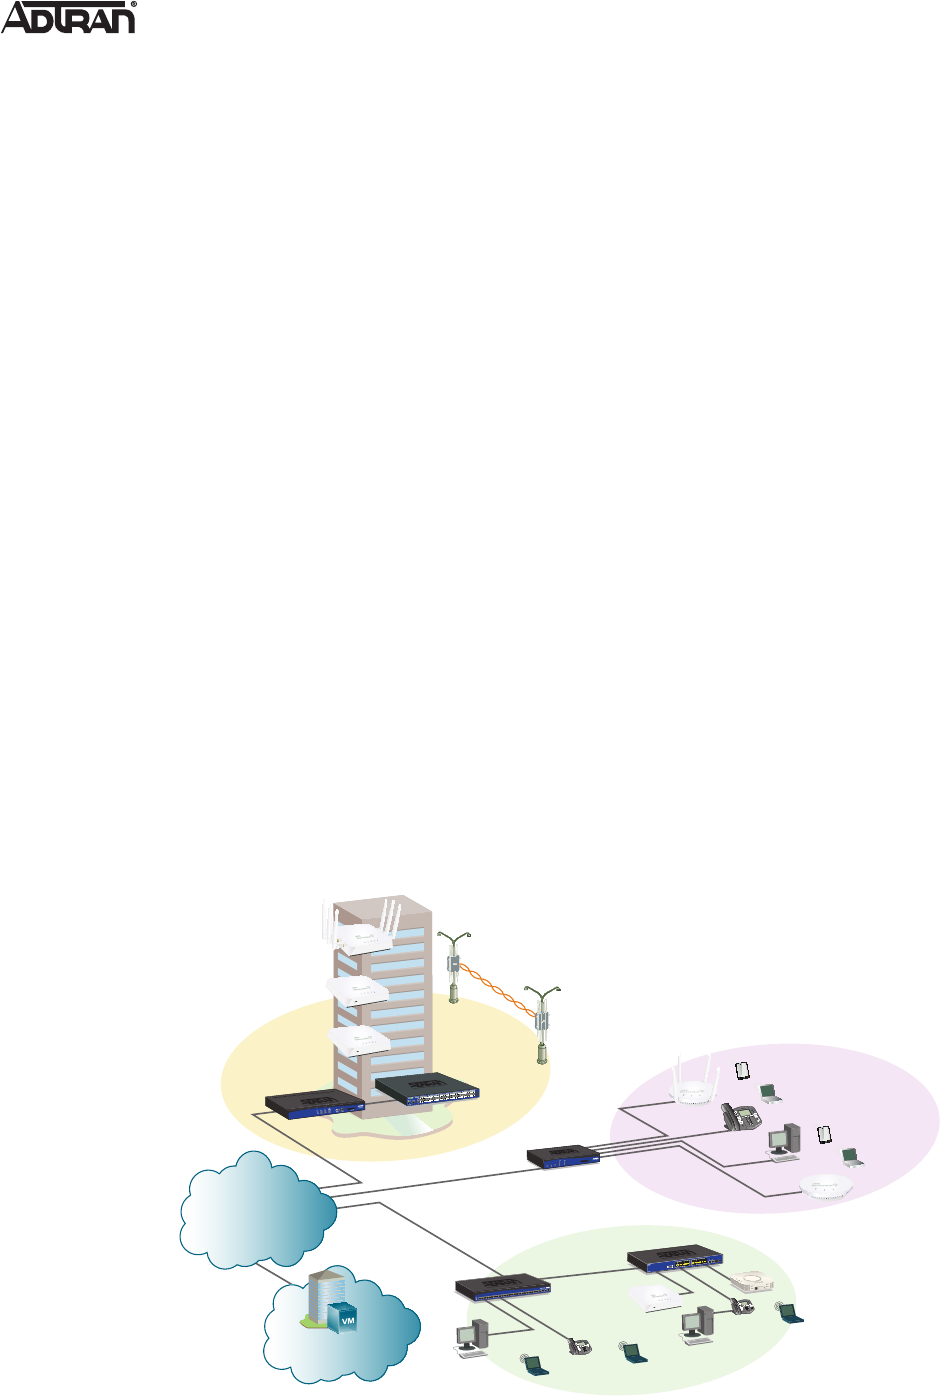 EN1900 Service Provider White Paper